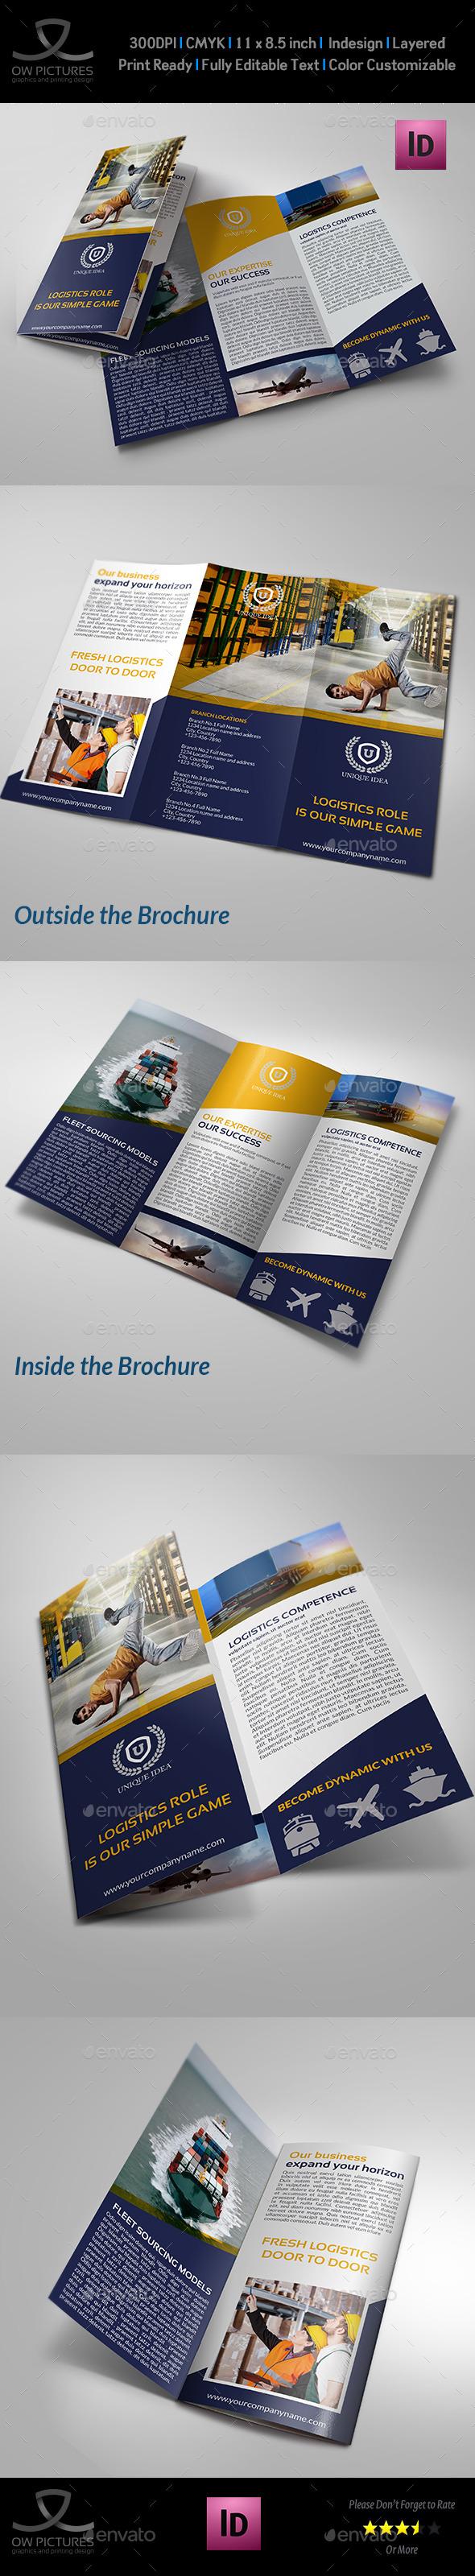 Logistic Services Tri-Fold Brochure Template Vol2 - Corporate Brochures